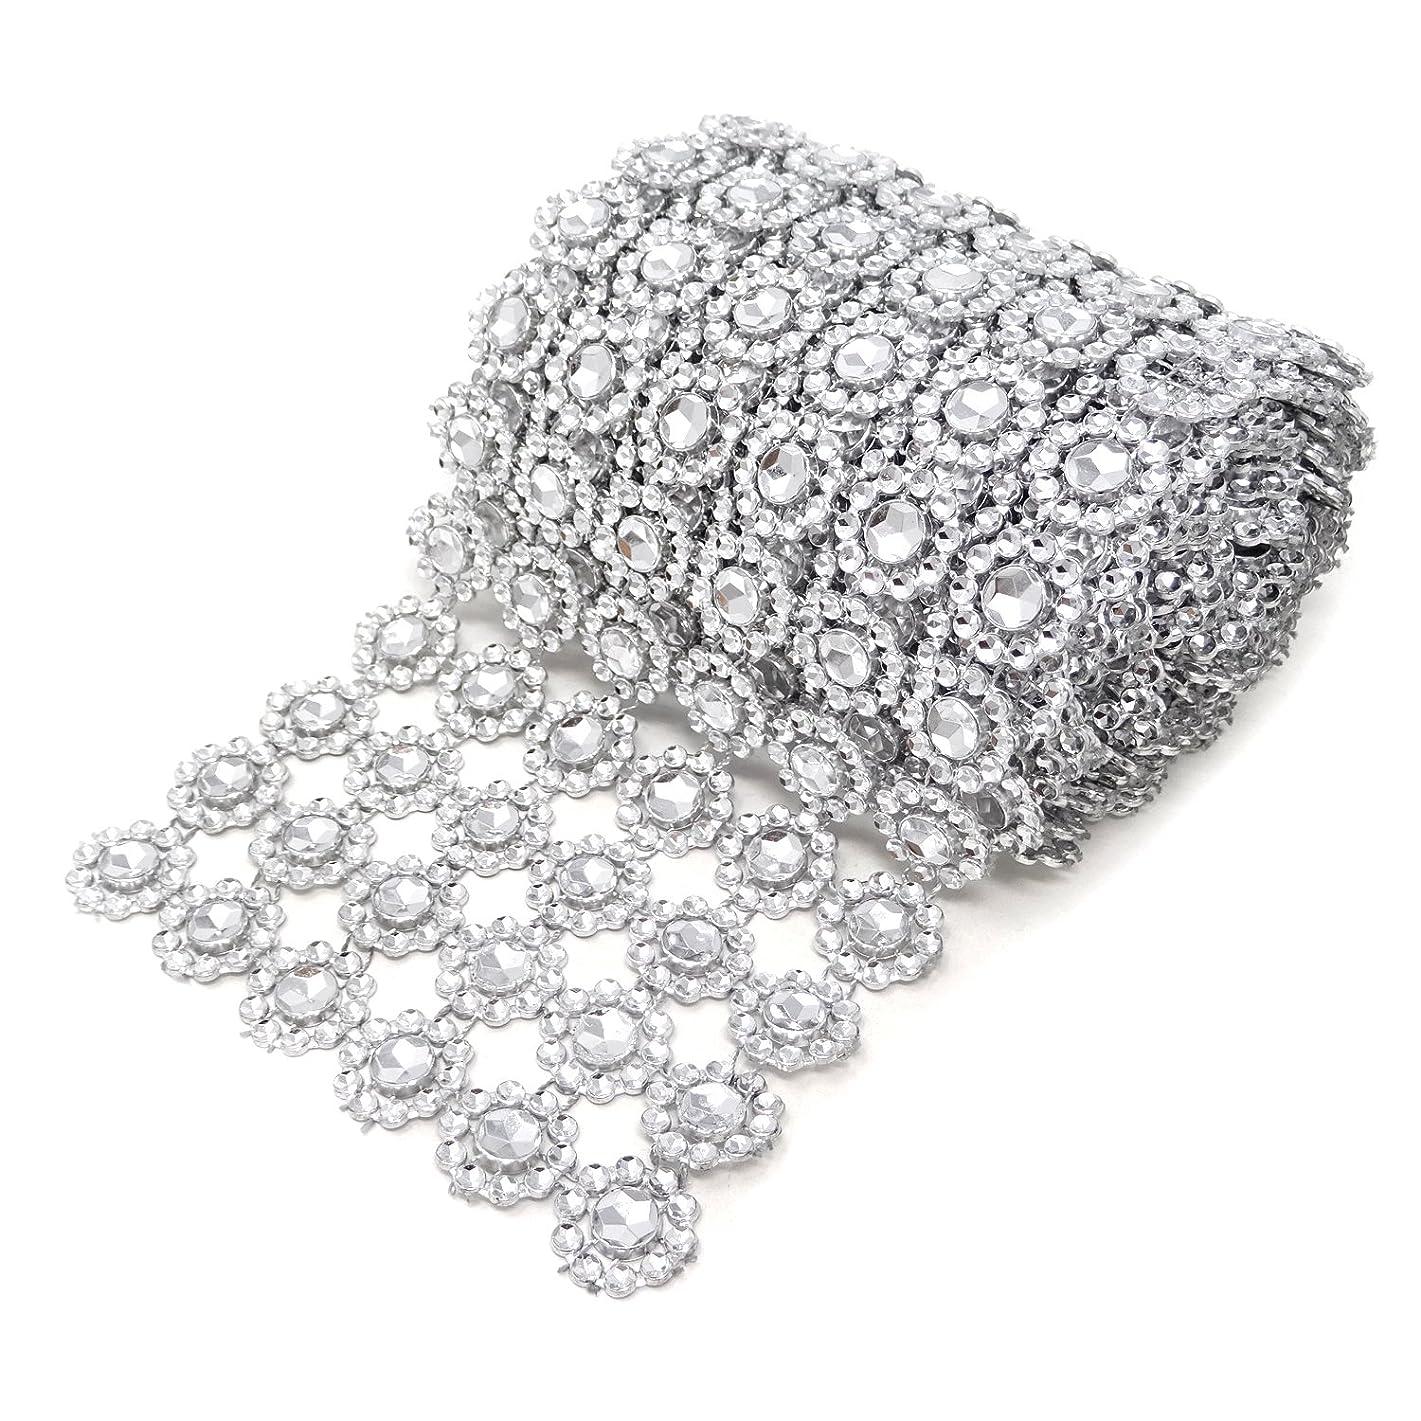 Honbay 4 Inch x 2 Yards Sparkling Silver Flower Shape Diamond Mesh Wrap Roll Faux Crystal Rhinestone Mesh Ribbon for Wedding, Birthday, Baby Shower, Arts & Crafts,etc